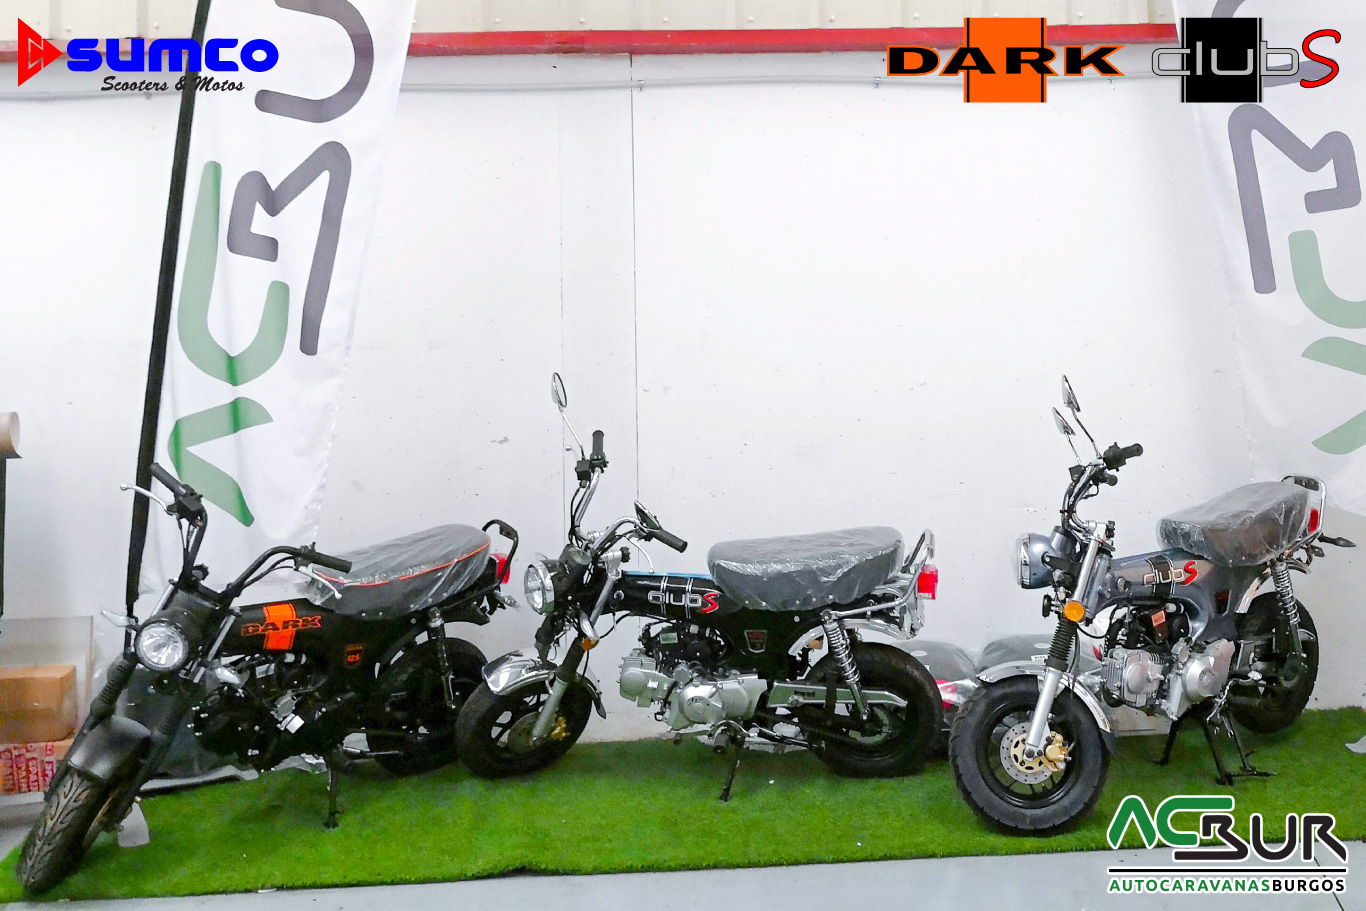 Alquiler Moto Autocaravanas